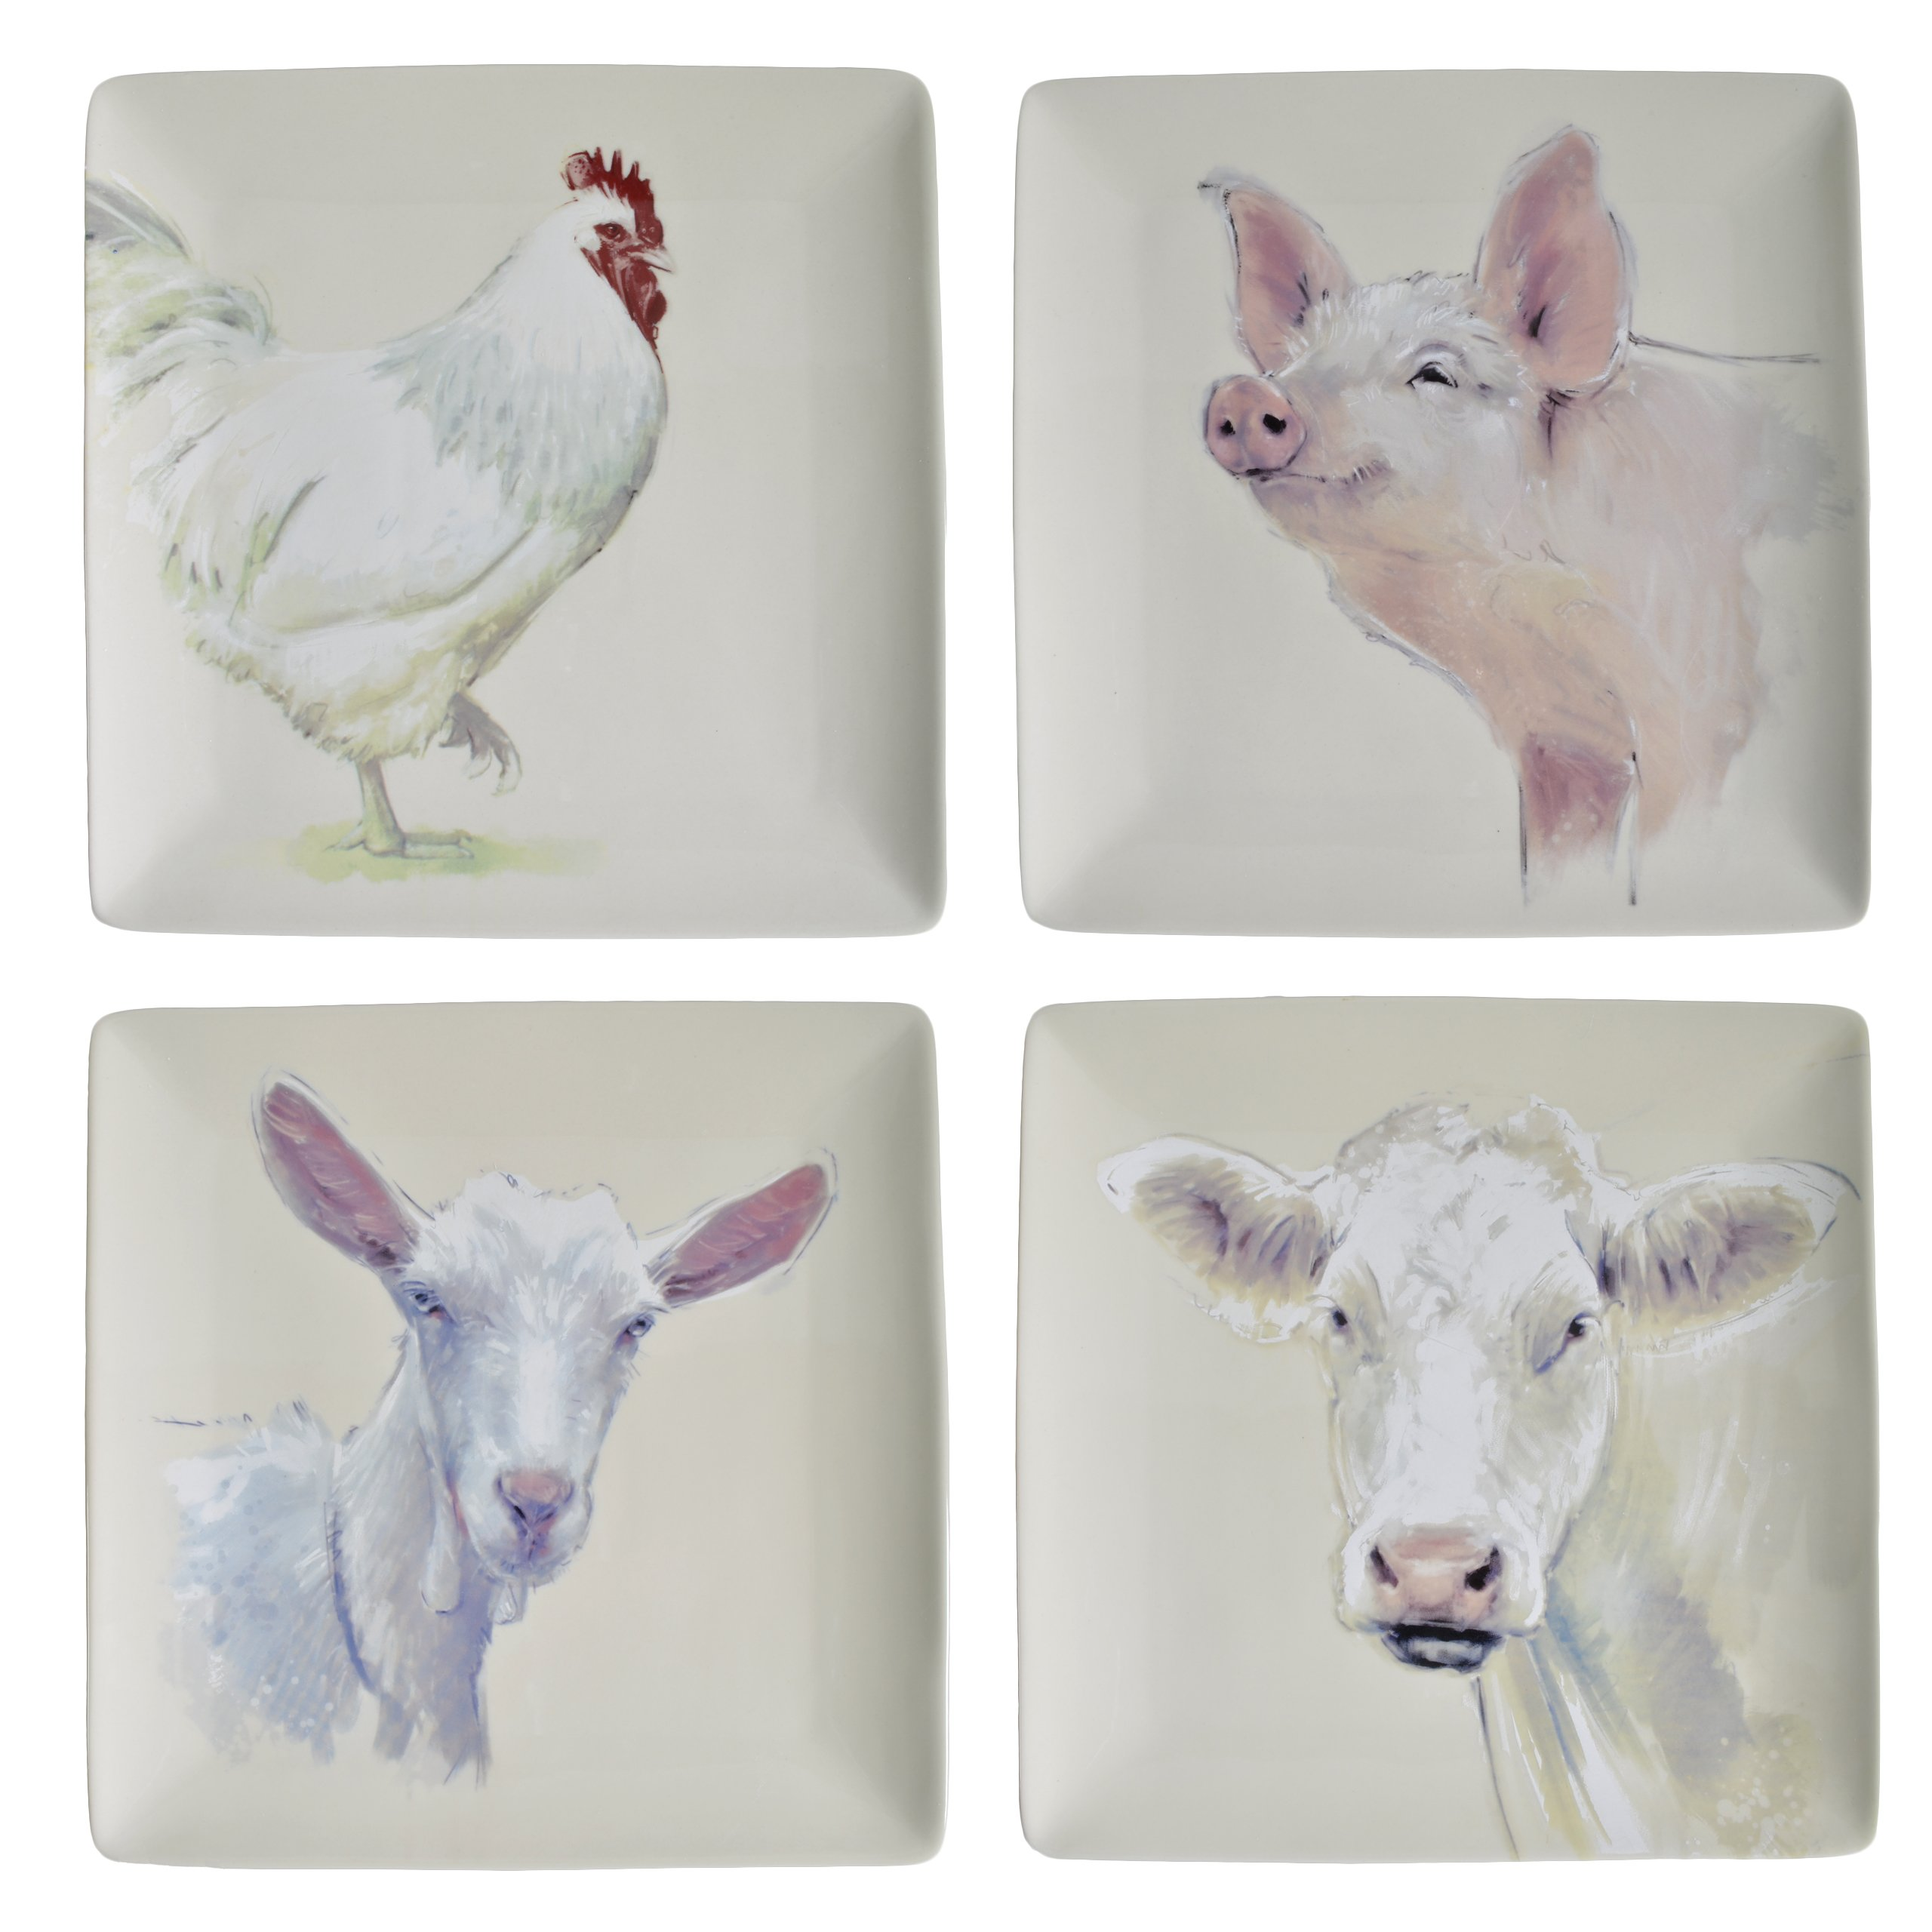 Square Farm Animal Plates (Set of 4)